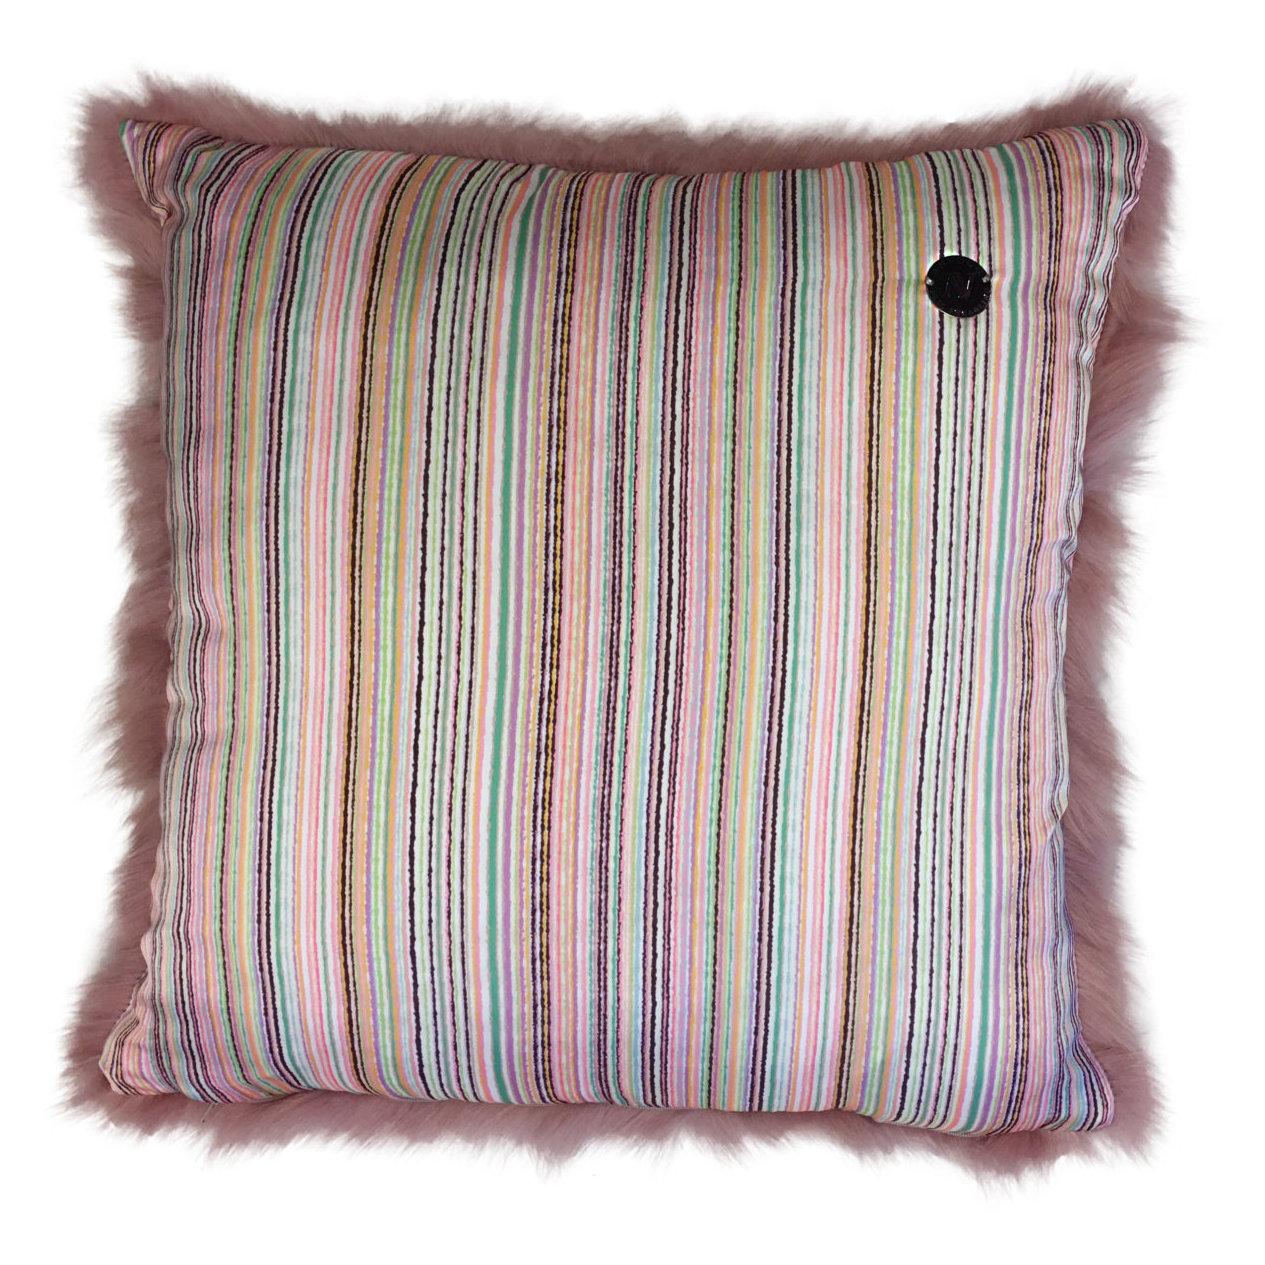 Shearling Pillow-D.Pink-50x50cm-SPDPINS3145050-arka - ANVOGG FEEL SHEARLING | ANVOGG